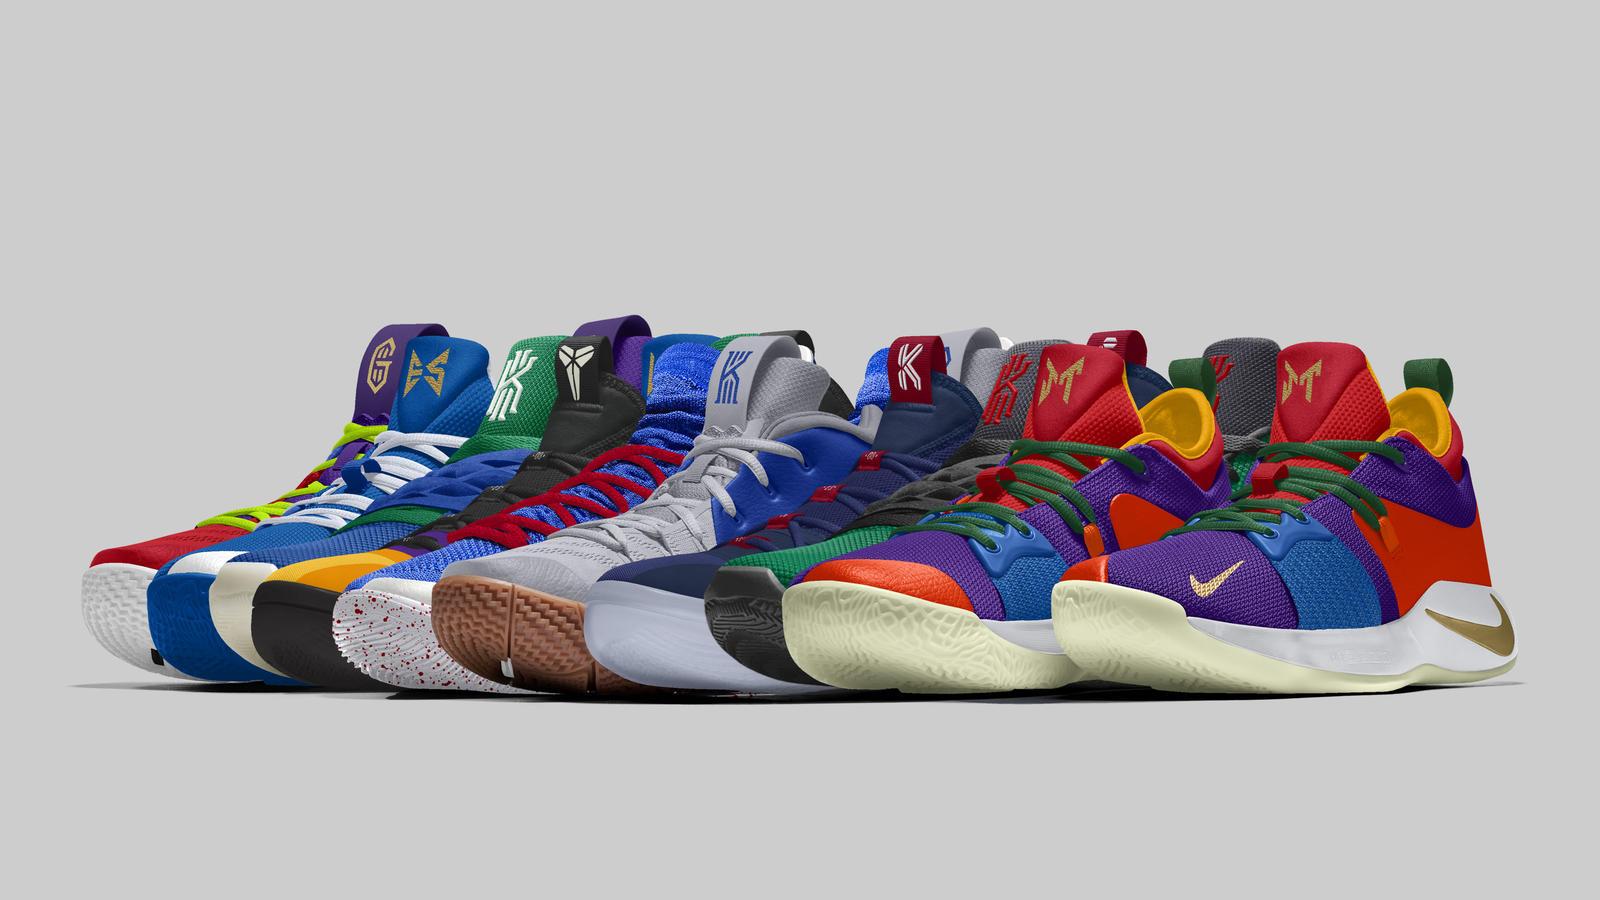 67db8d63a Nike Unveils Wild PEs for Jayson Tatum